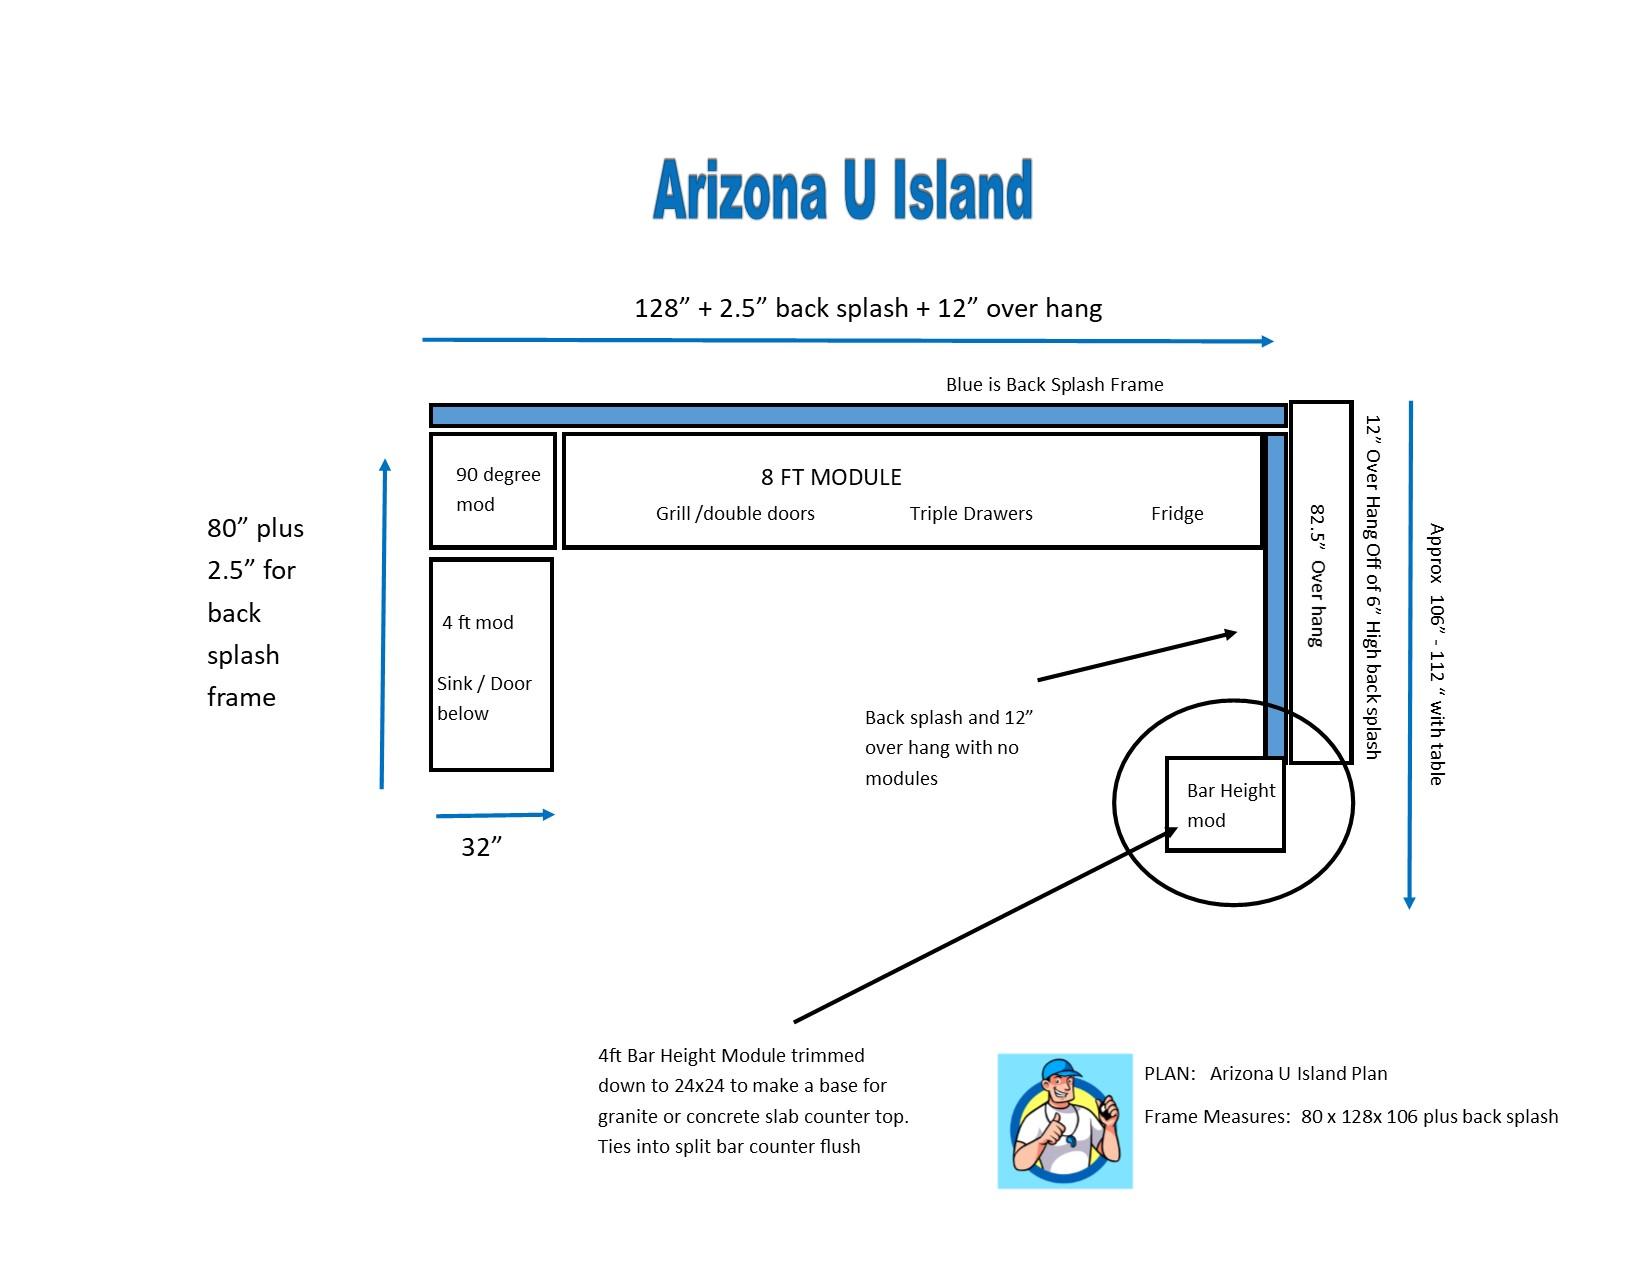 arizona-u-island-plan.jpg